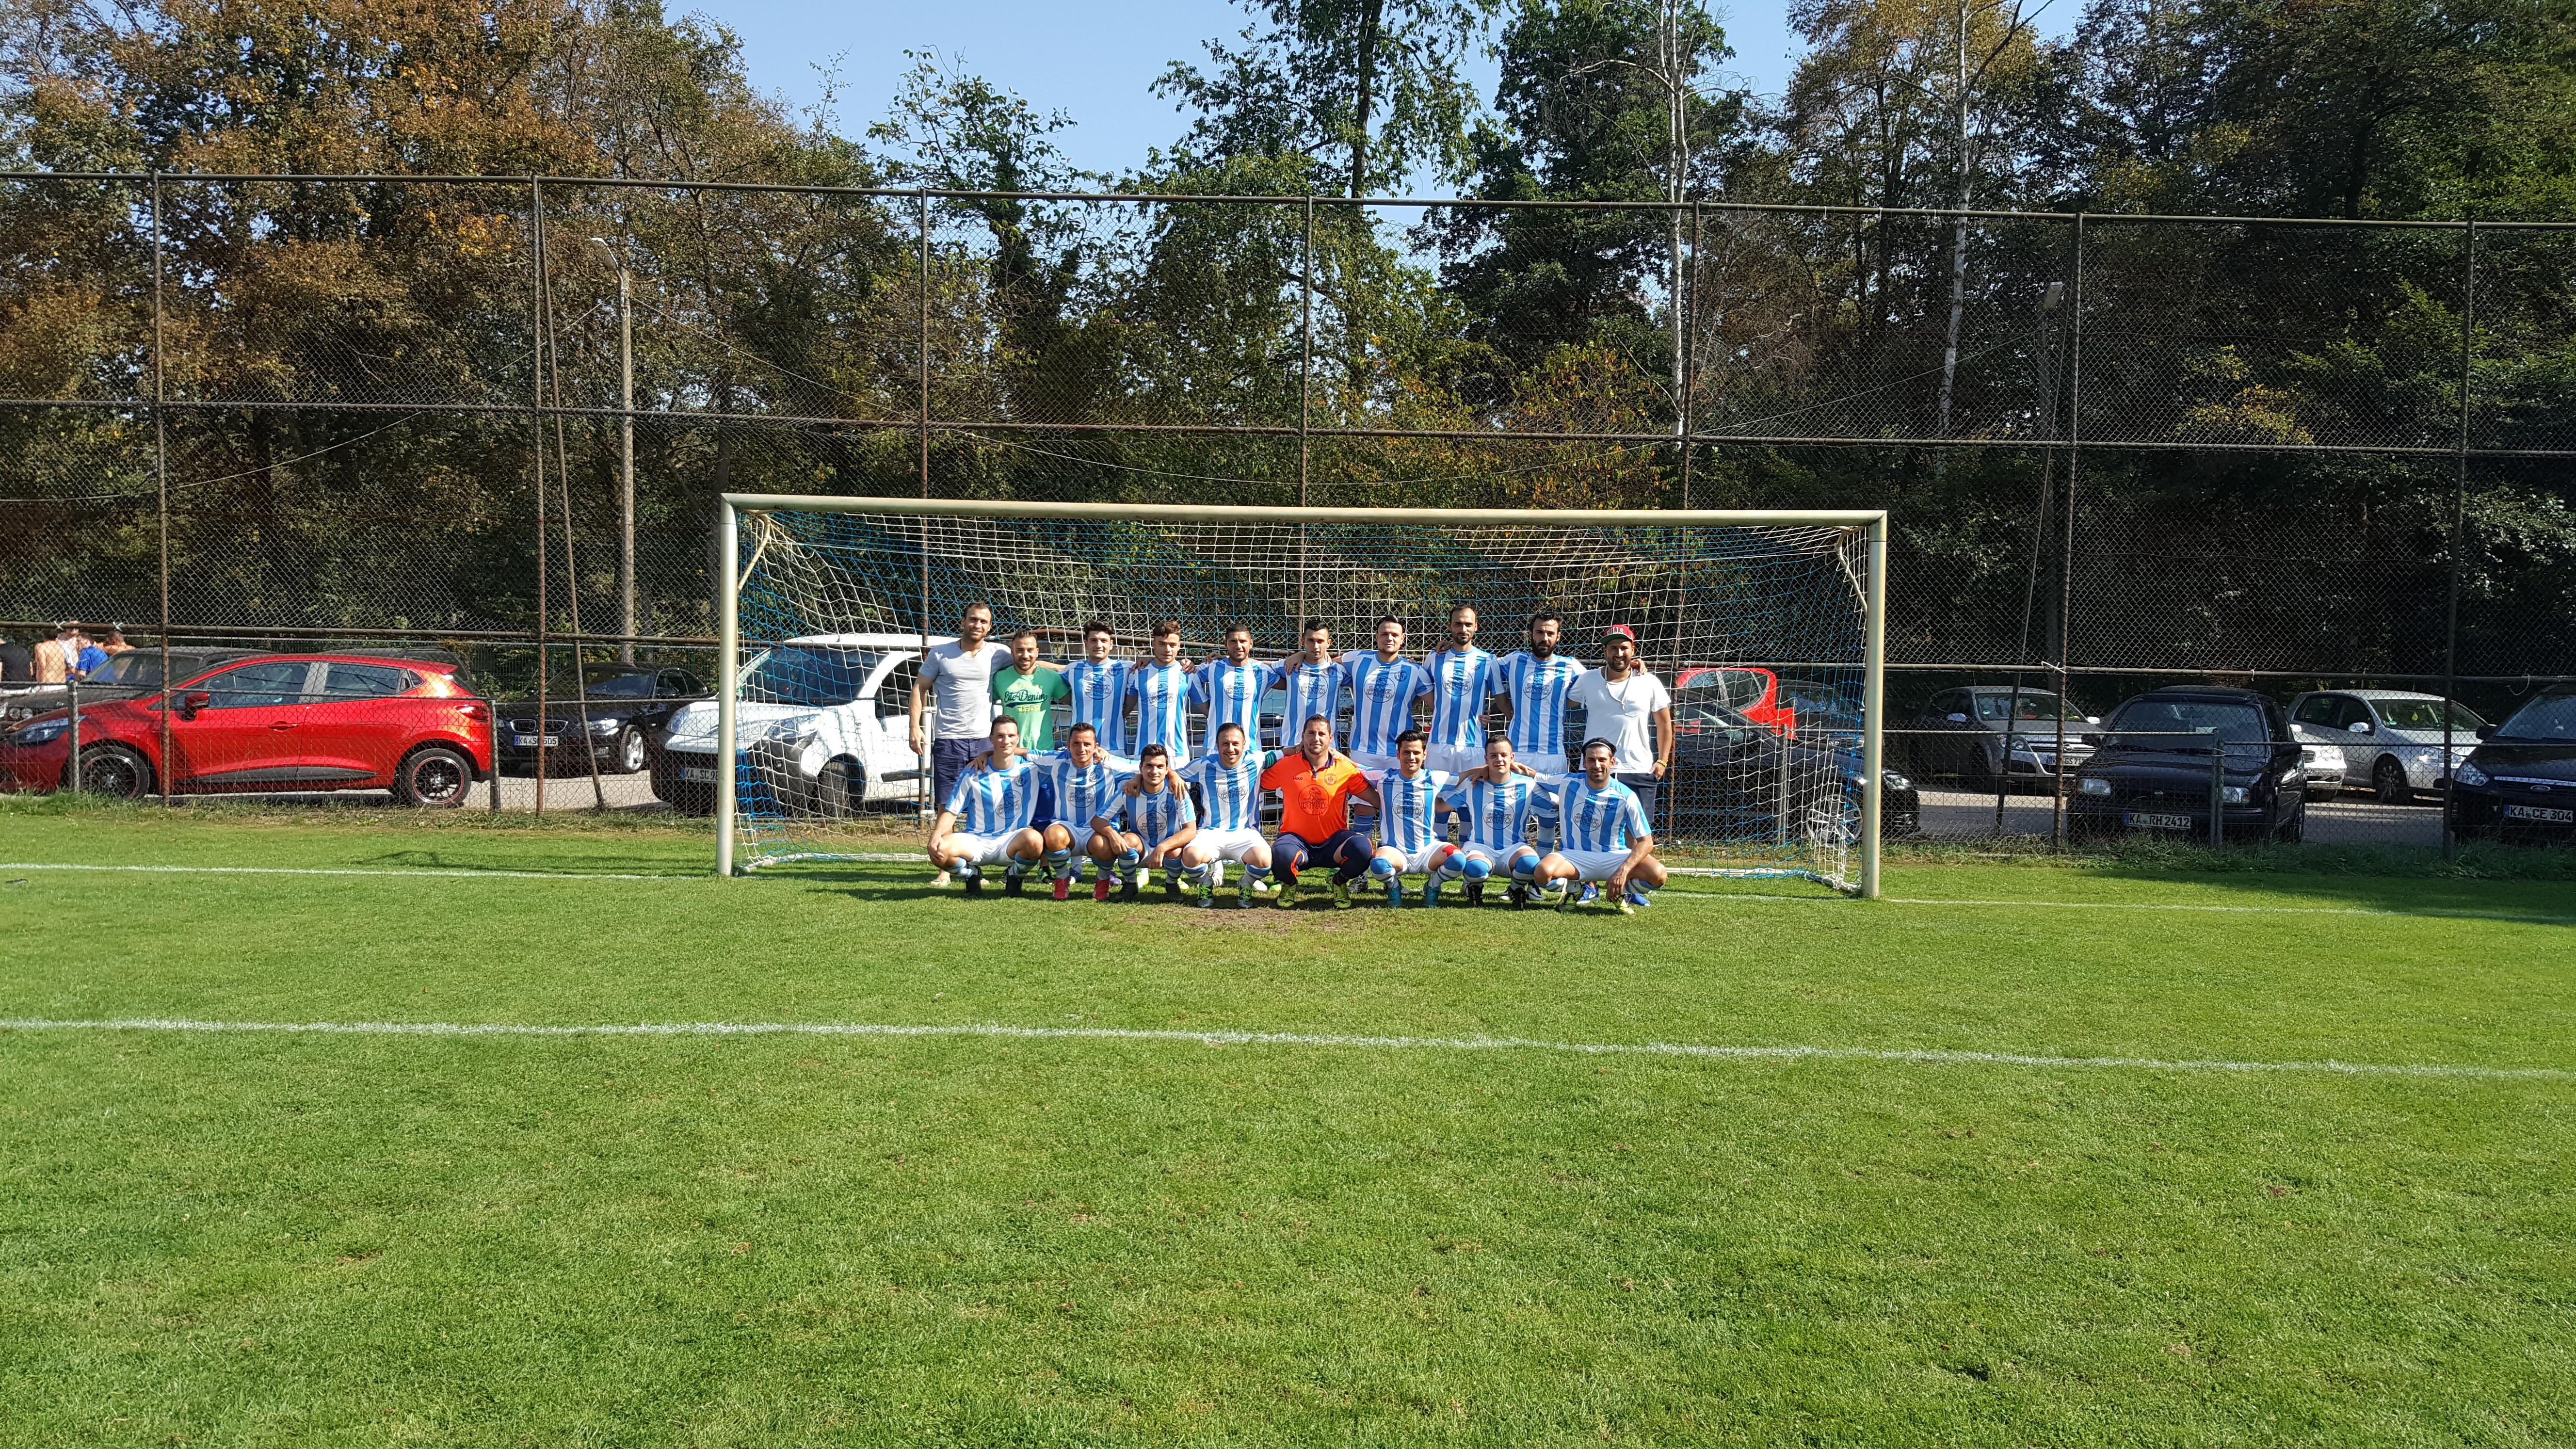 Saison 1617 B1 Spvgg Olympia Hertha